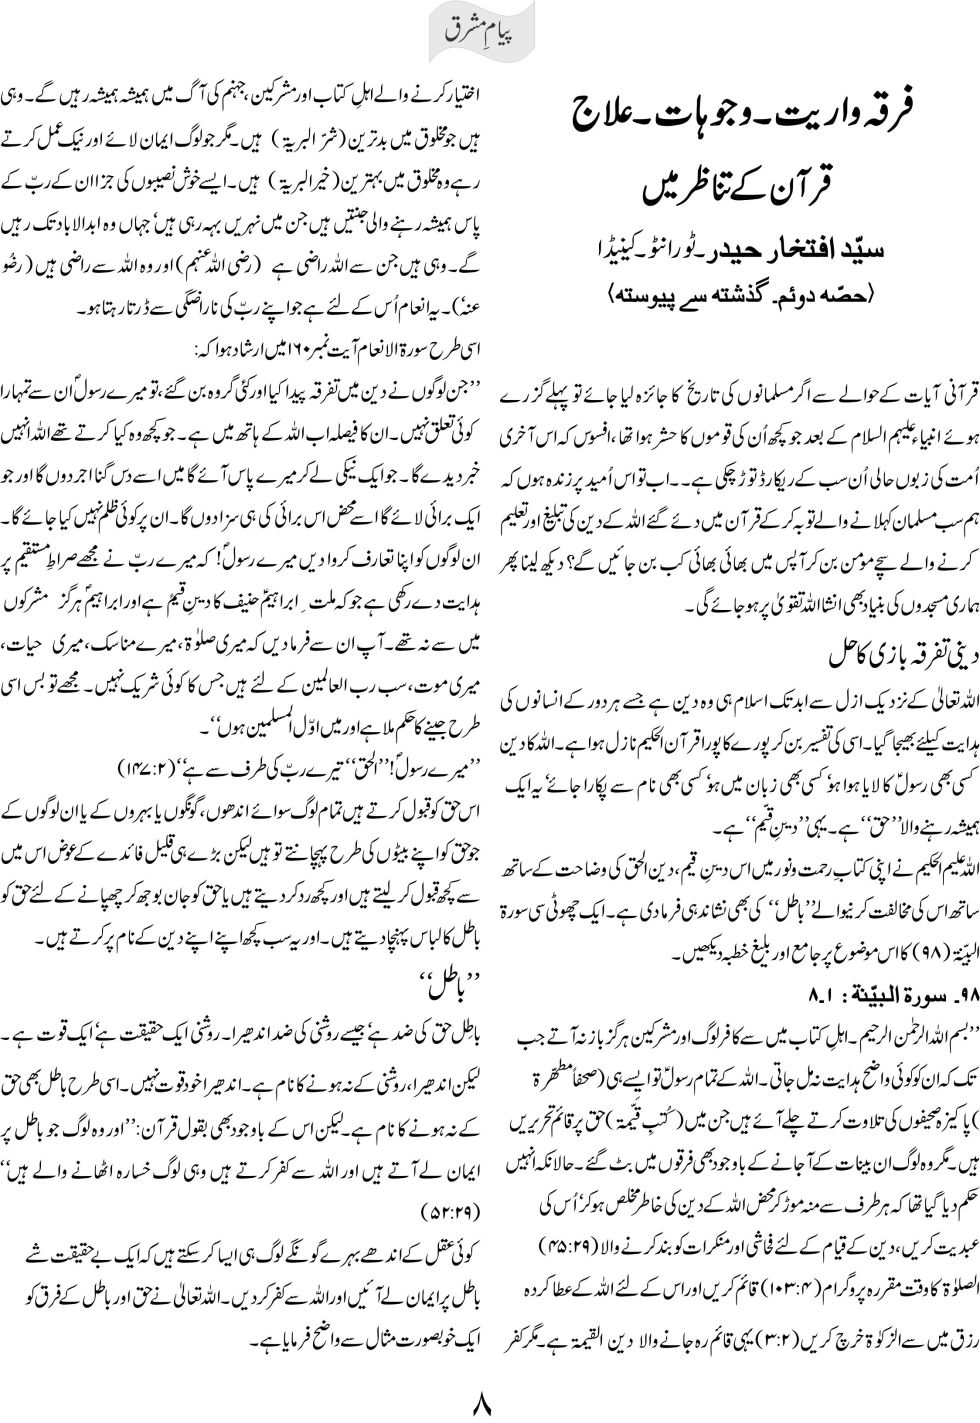 Firqa wariyat wajoohat ilaj Quran ke tanazur main - Part 2 a